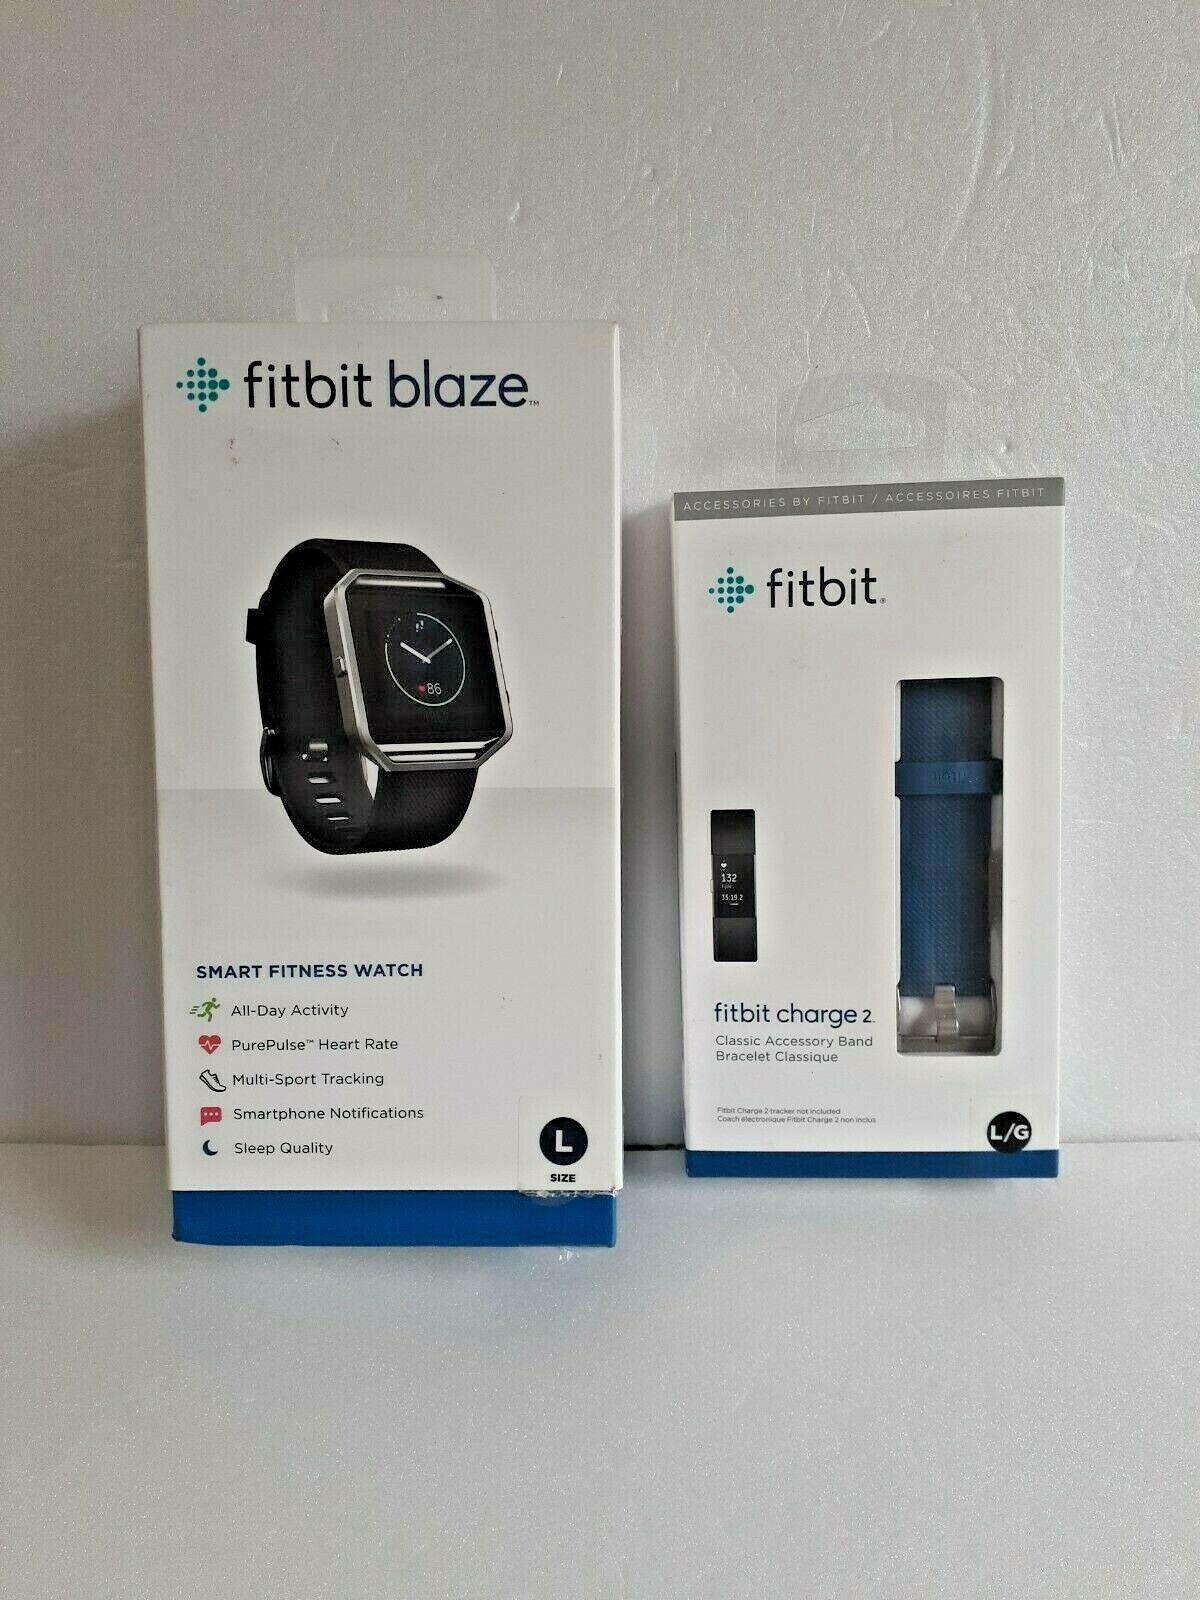 Fitbit Blaze FB502 Smart Fitness Watch Smartwatch Activity Tracker Blue Large